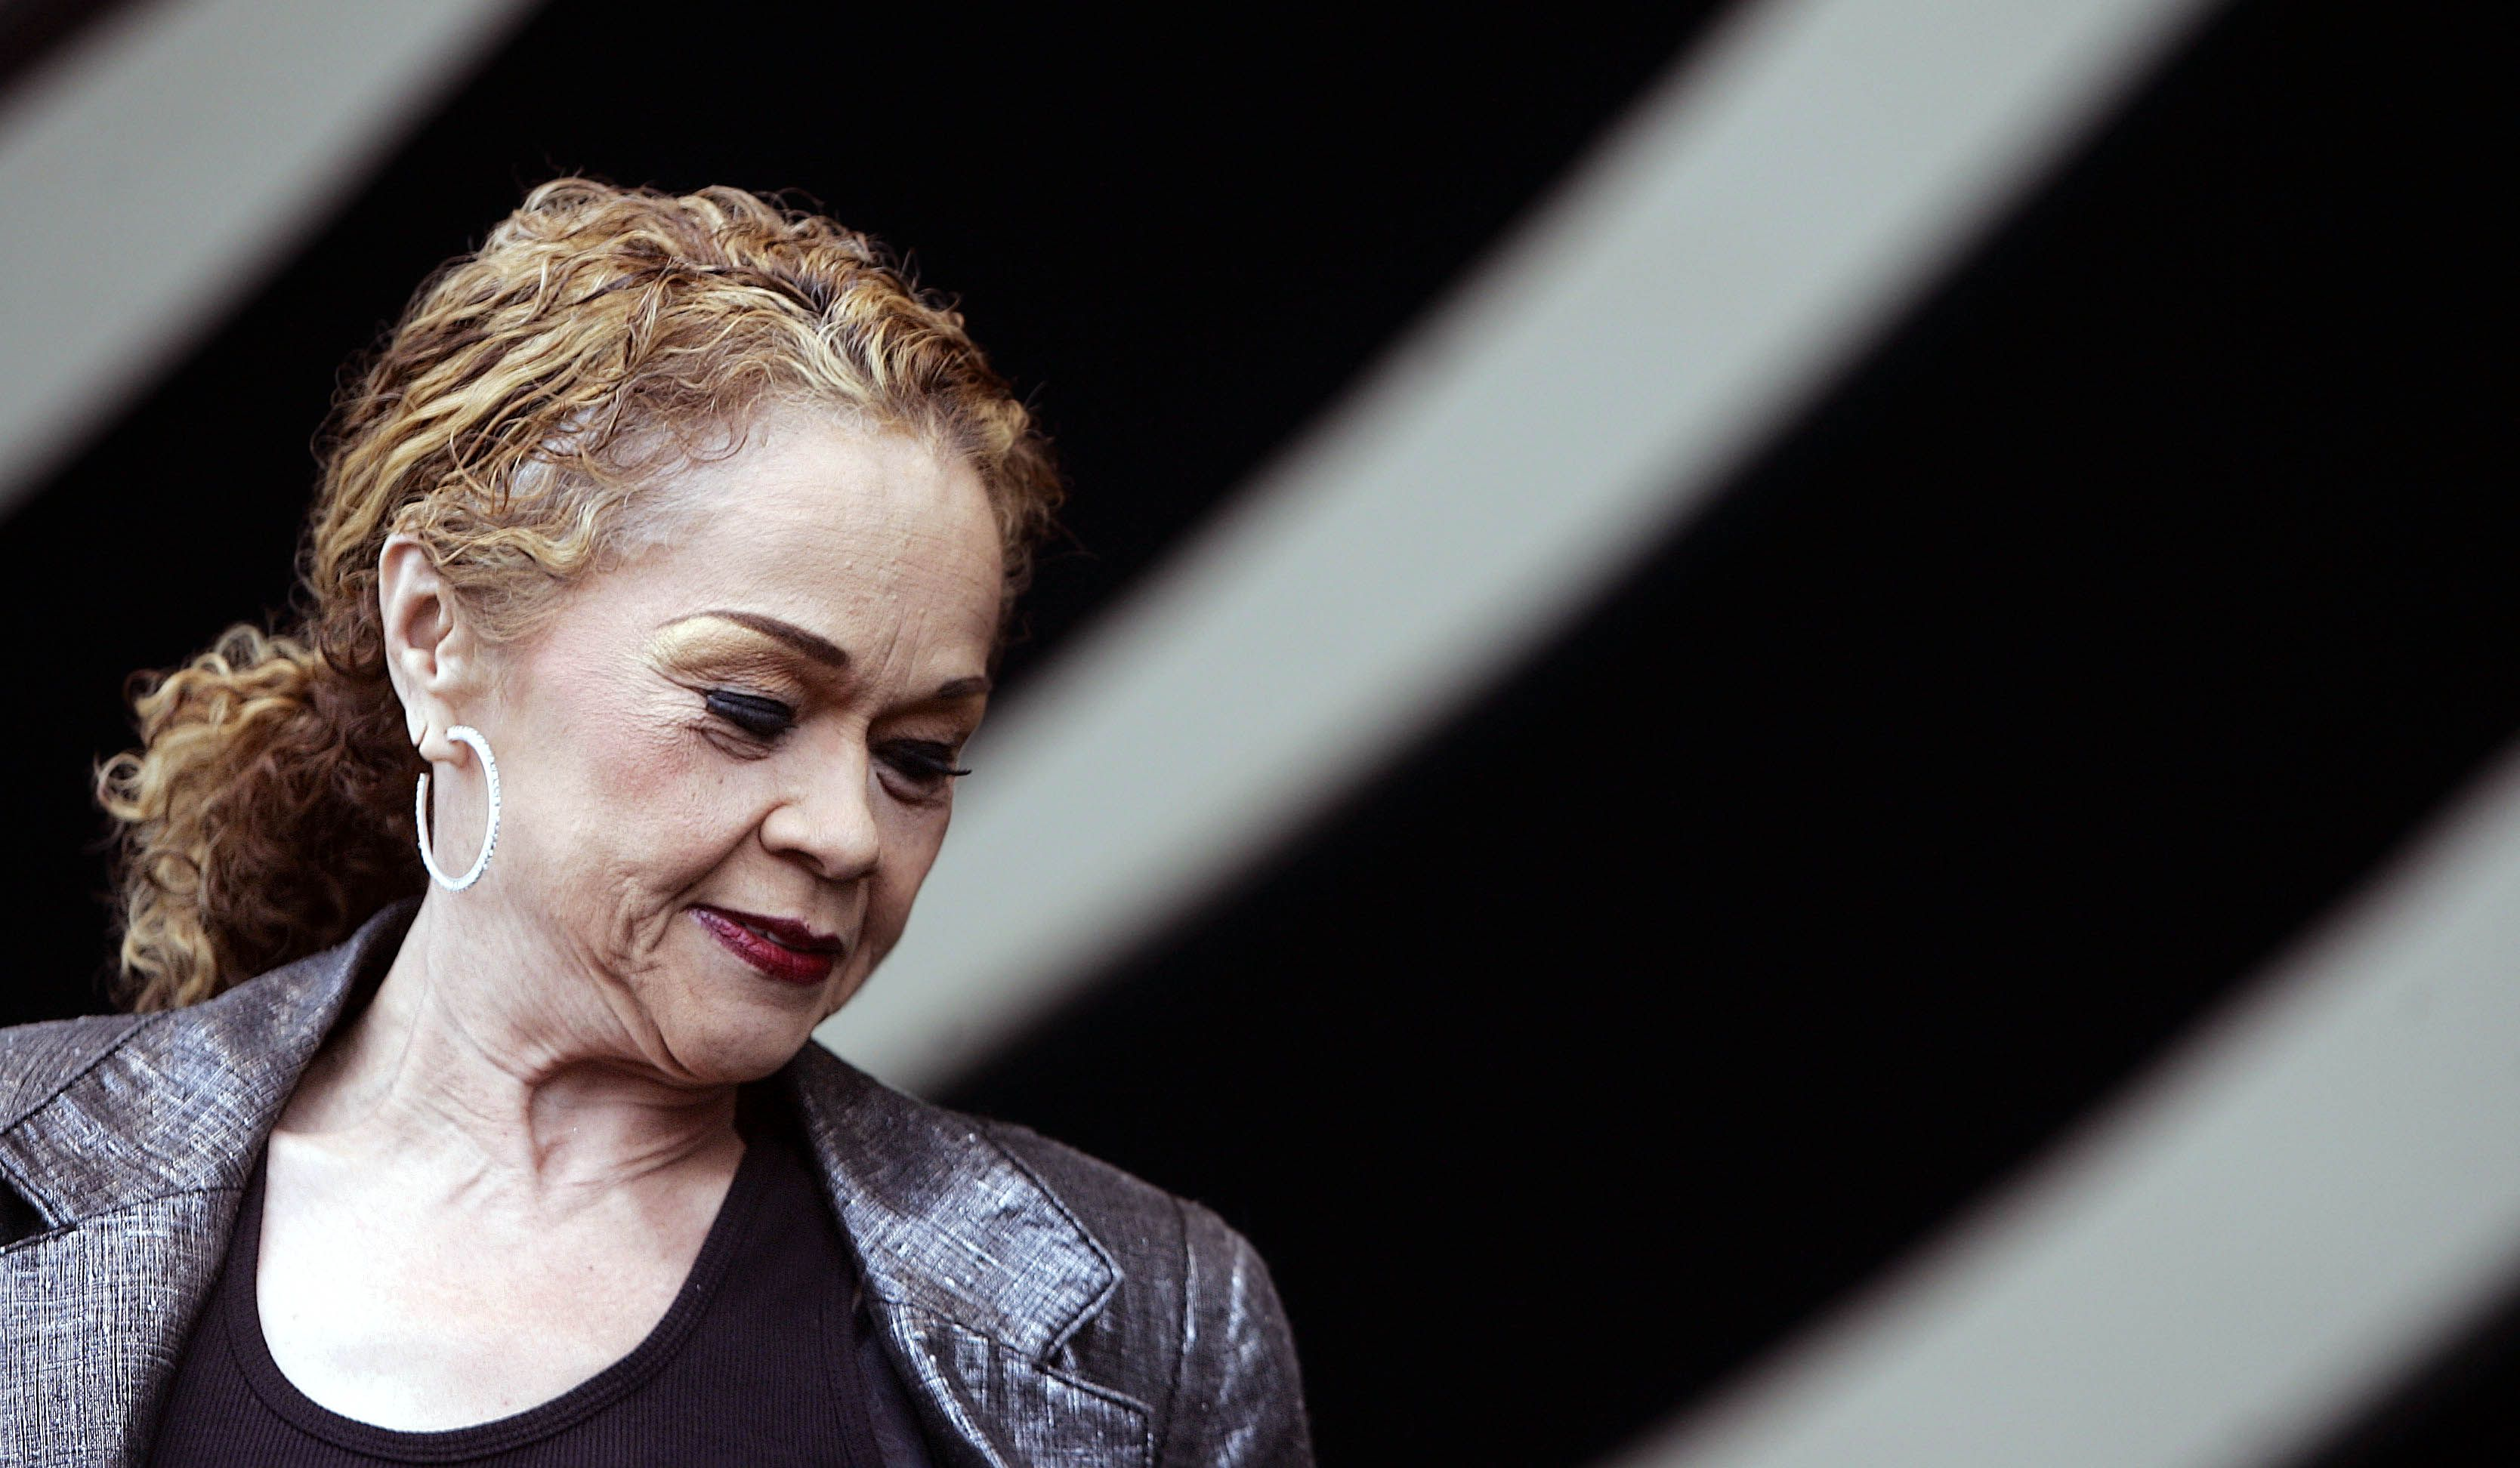 Blues legend Etta James dies at 73 - The Boston Globe